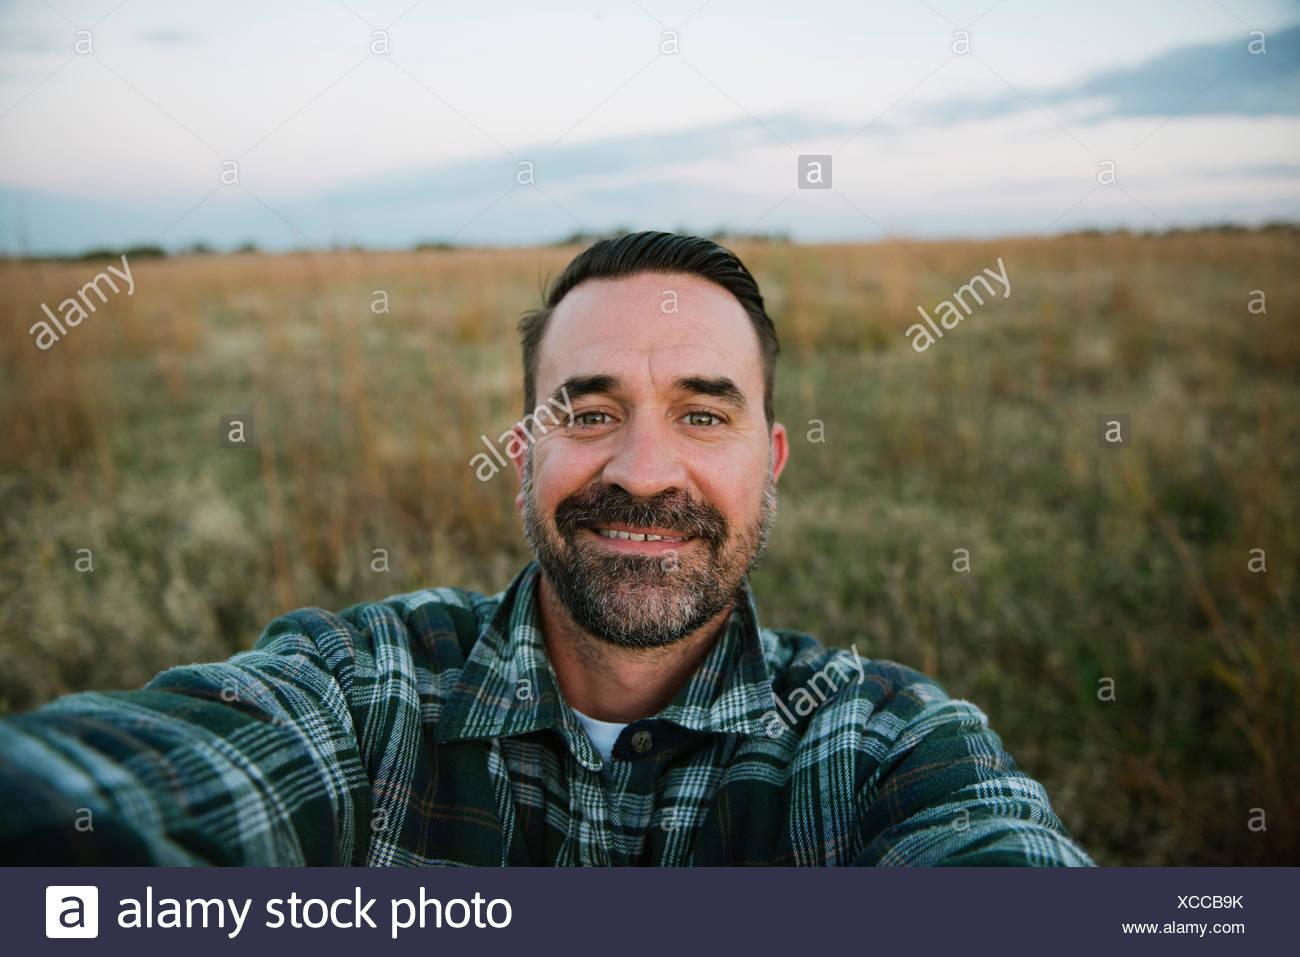 Self portrait of smiling farmer in field, Plattsburg, Missouri, USA - Stock Image